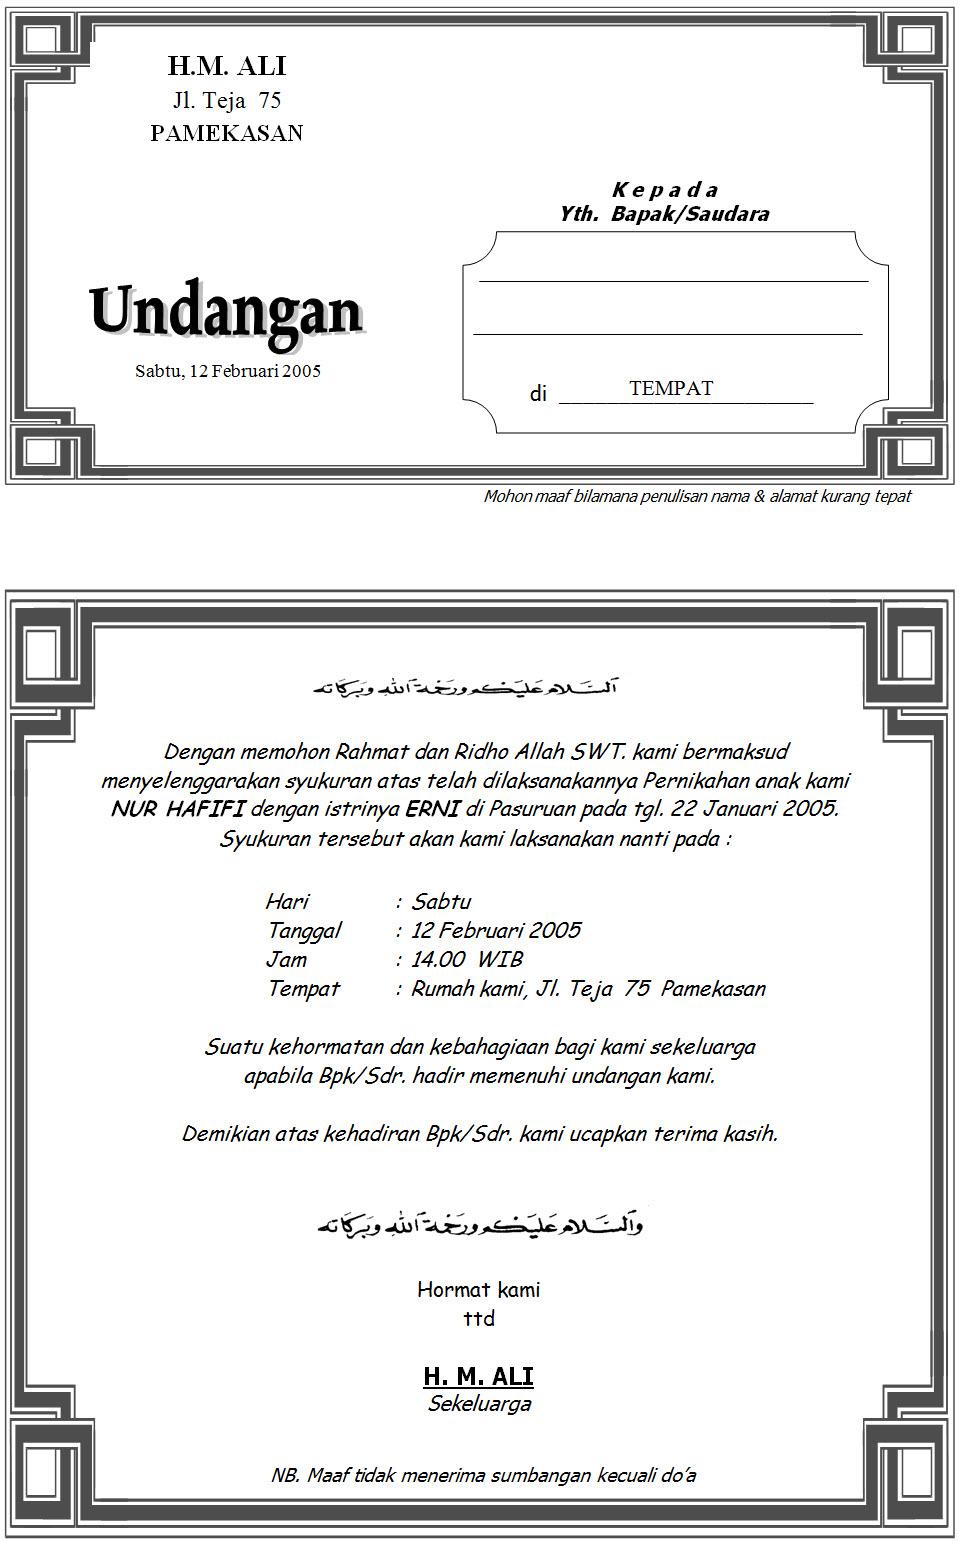 contoh tulisan undangan pernikahan